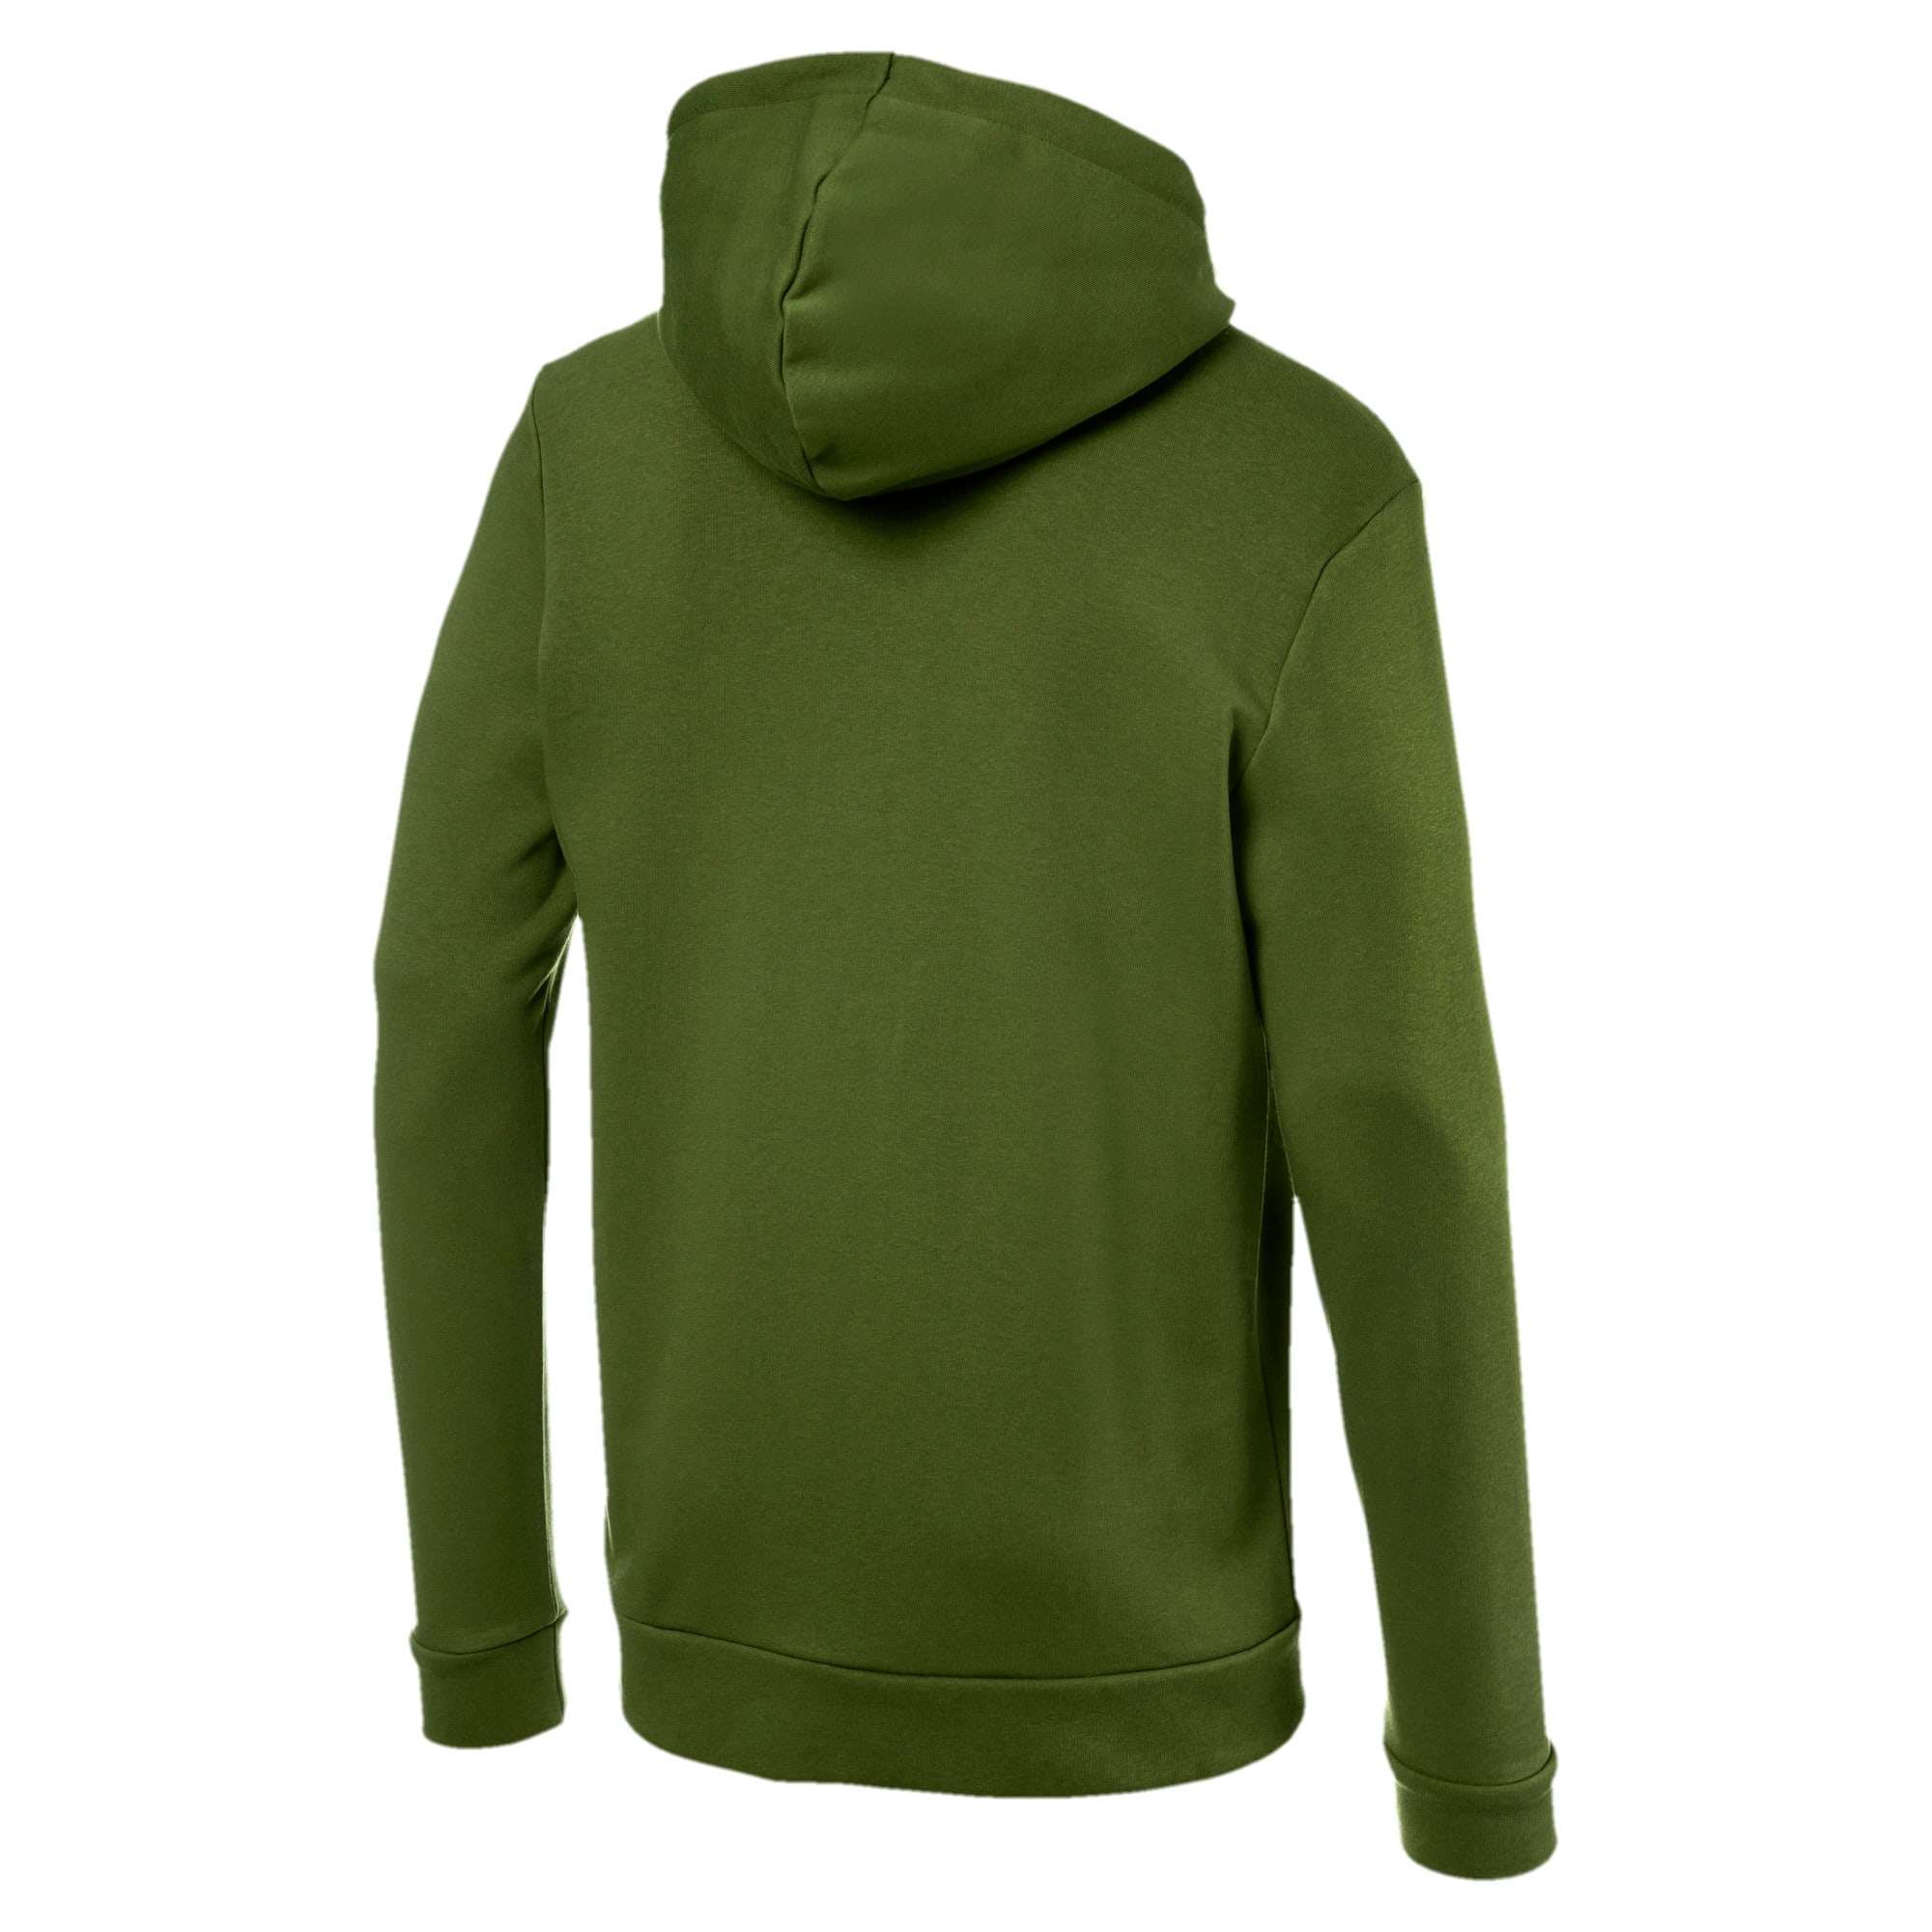 Miniatura 5 de Chaqueta con capucha Amplified para hombre, Garden Green, mediano